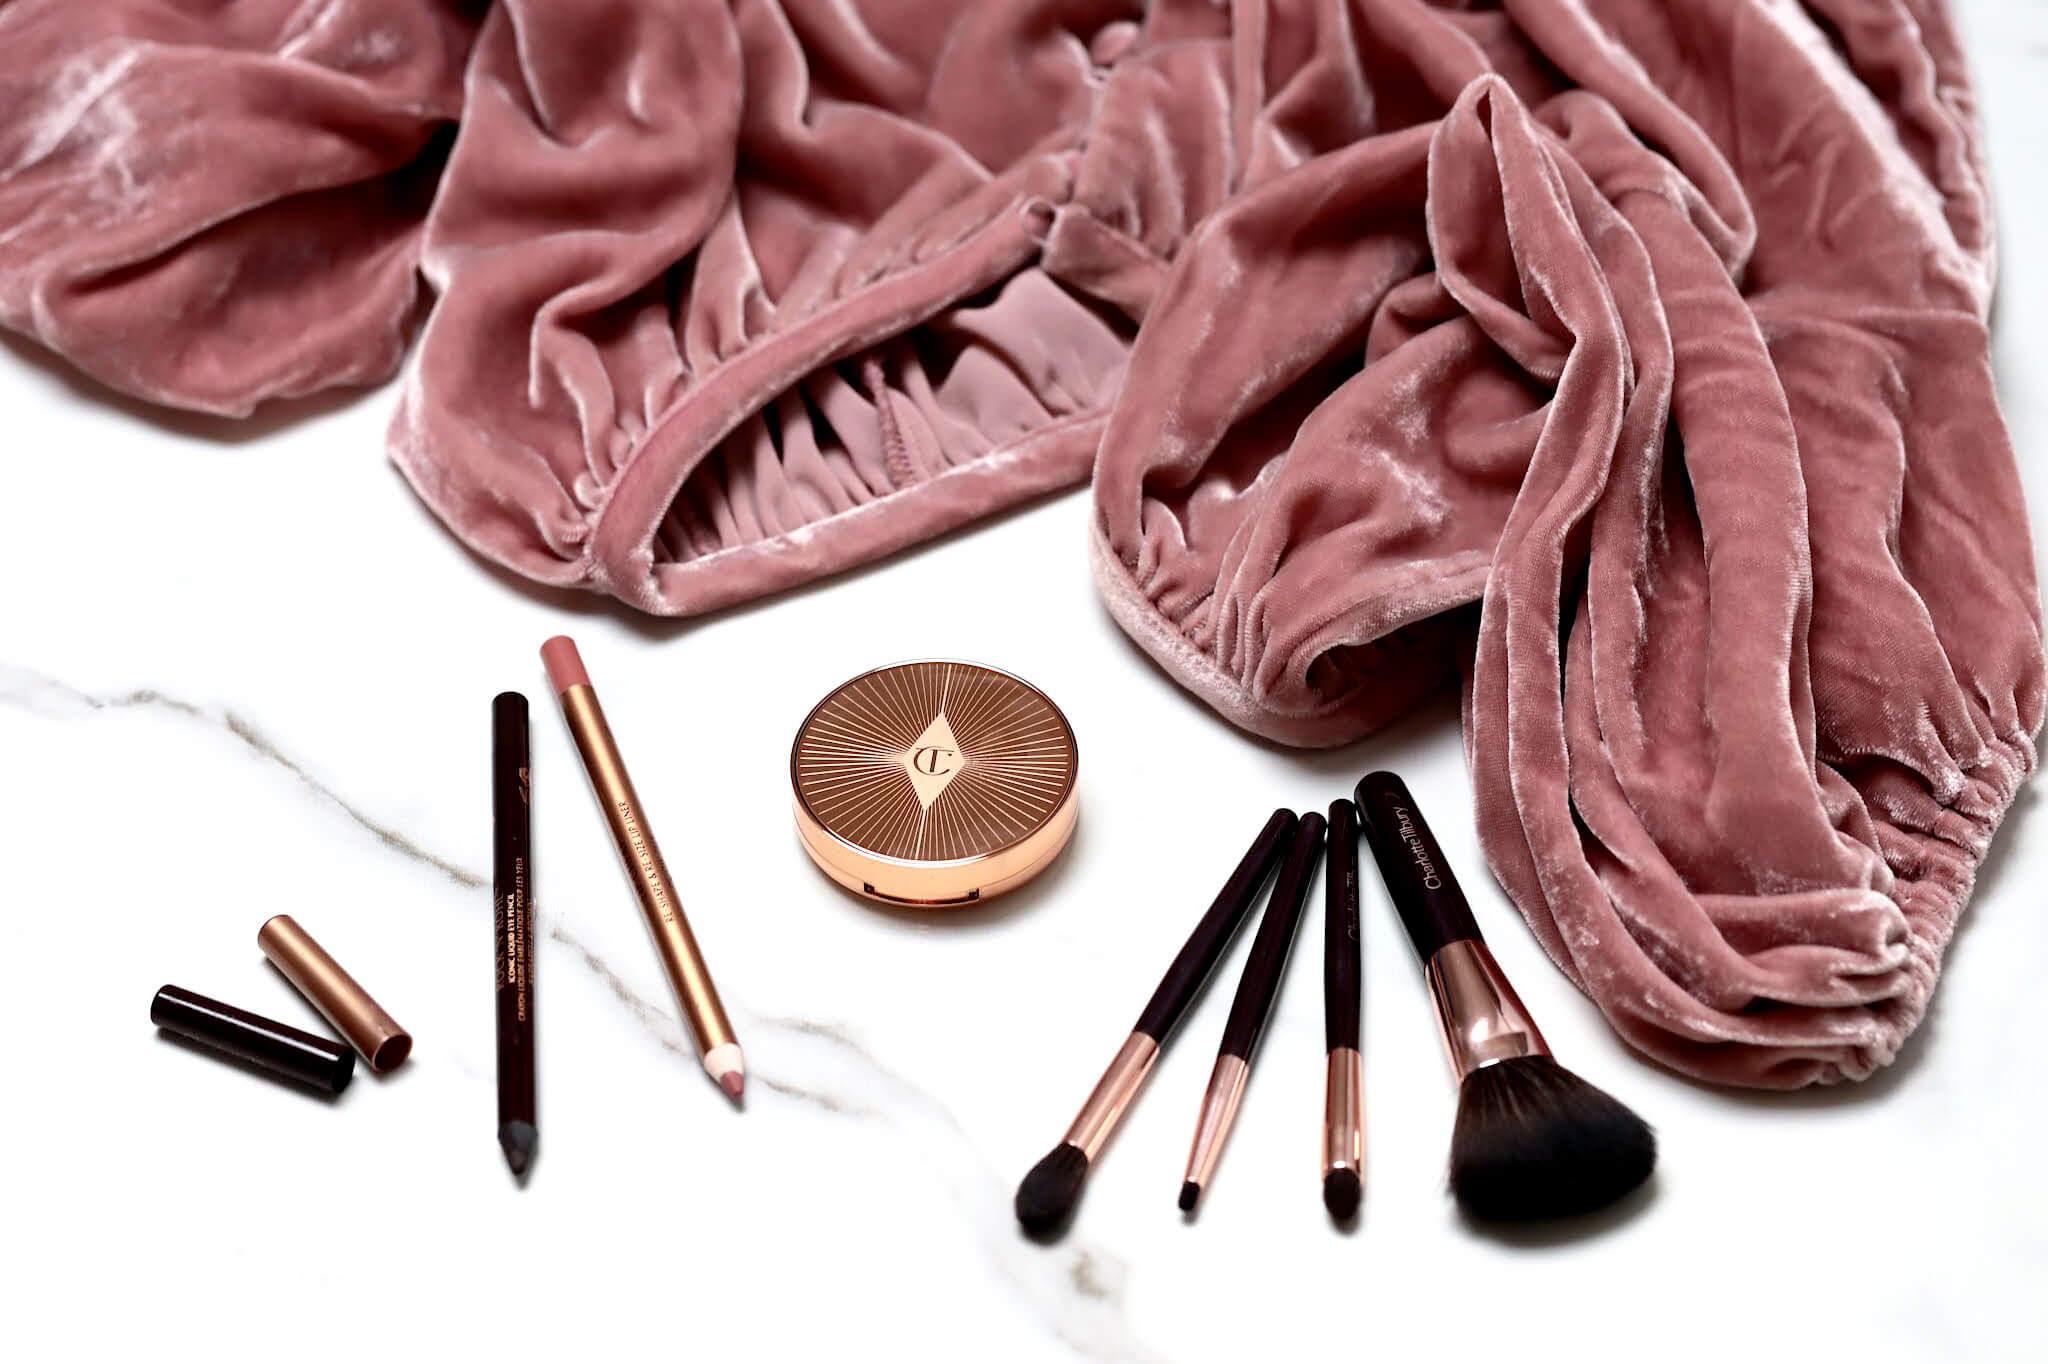 Charlotte Tilbury Pillow Talk Maquillage